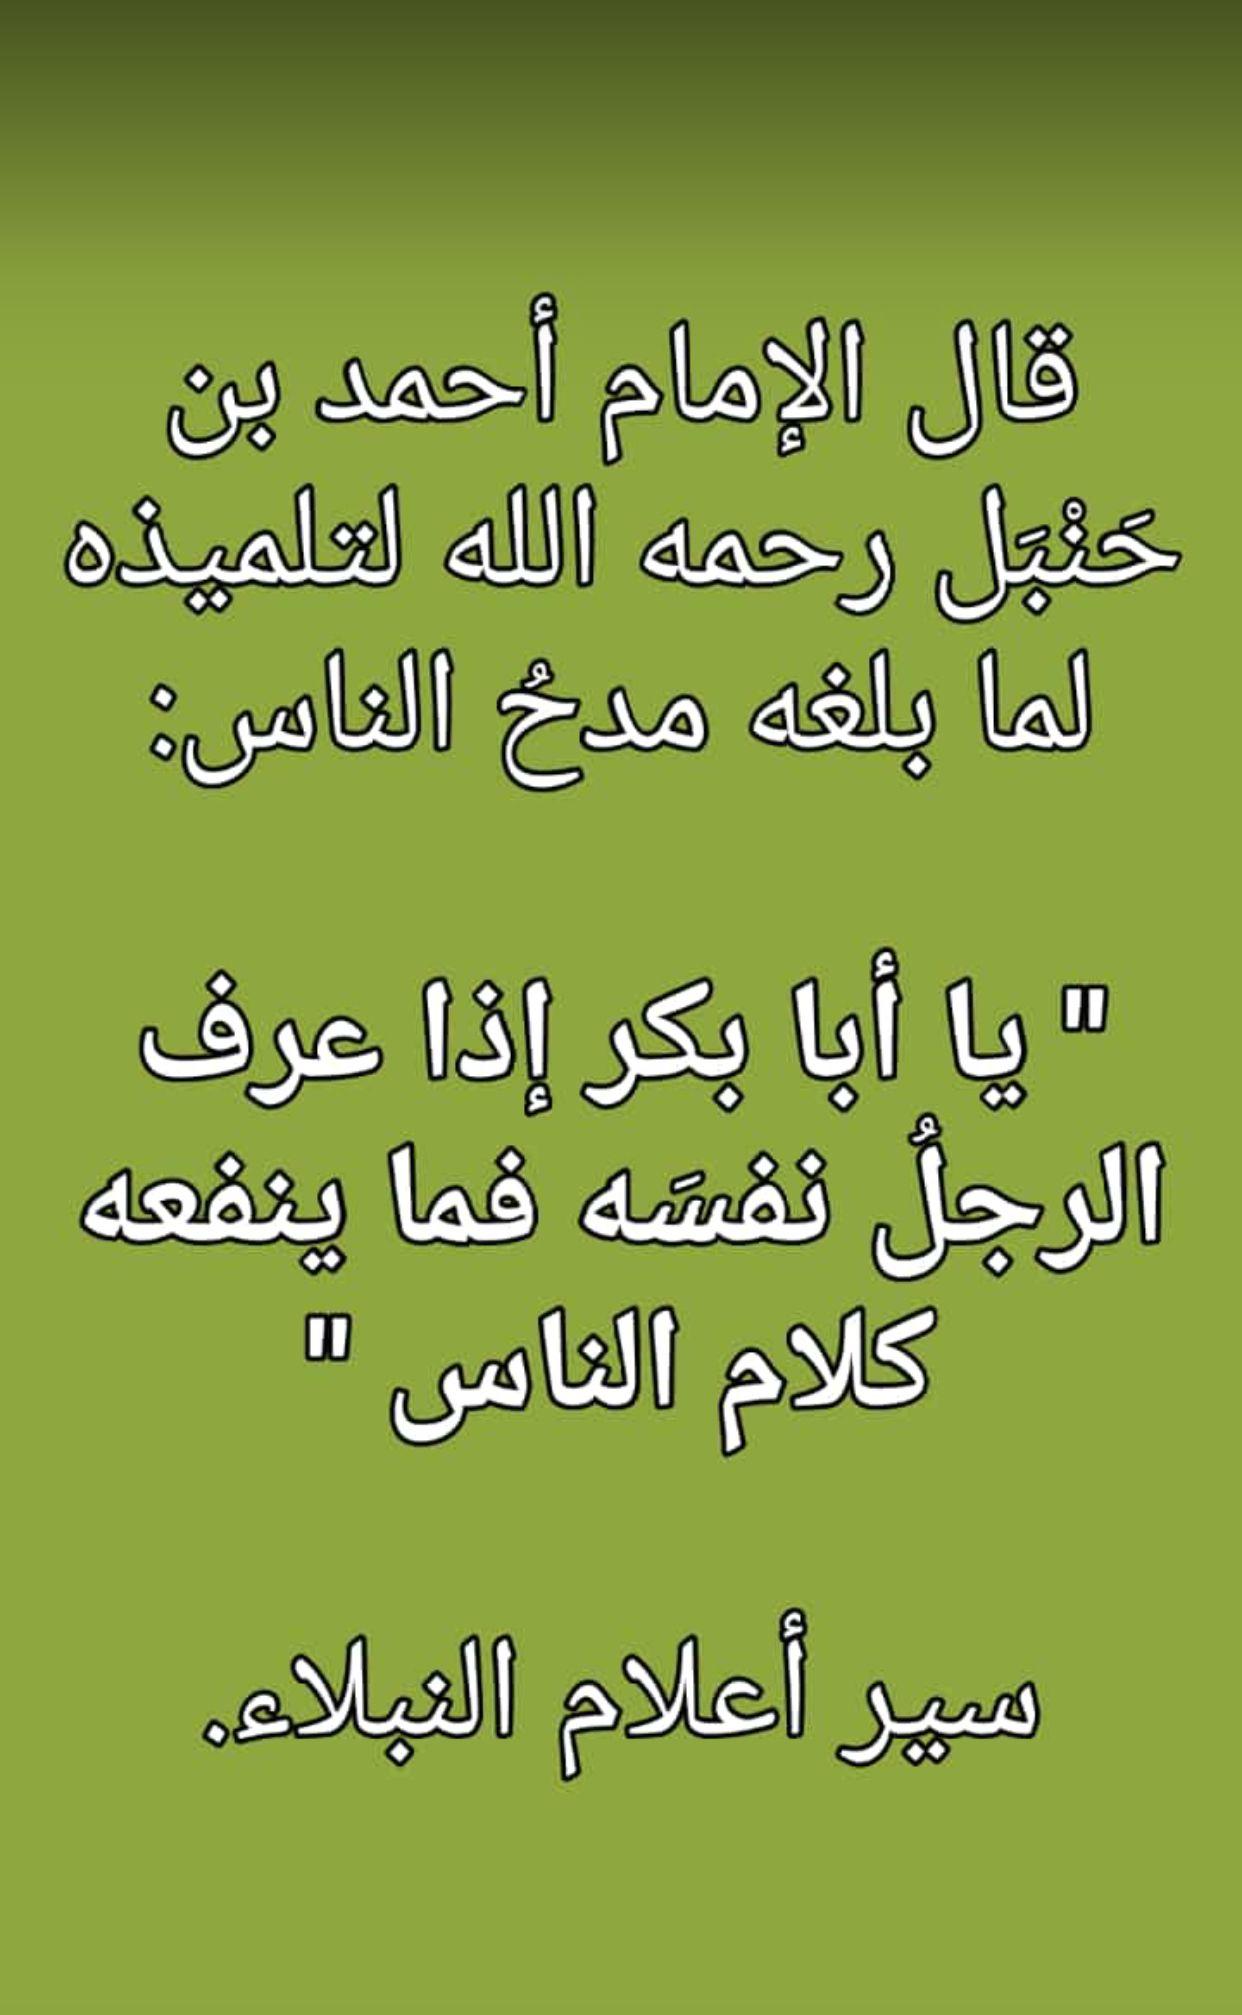 Pin On الاسلام